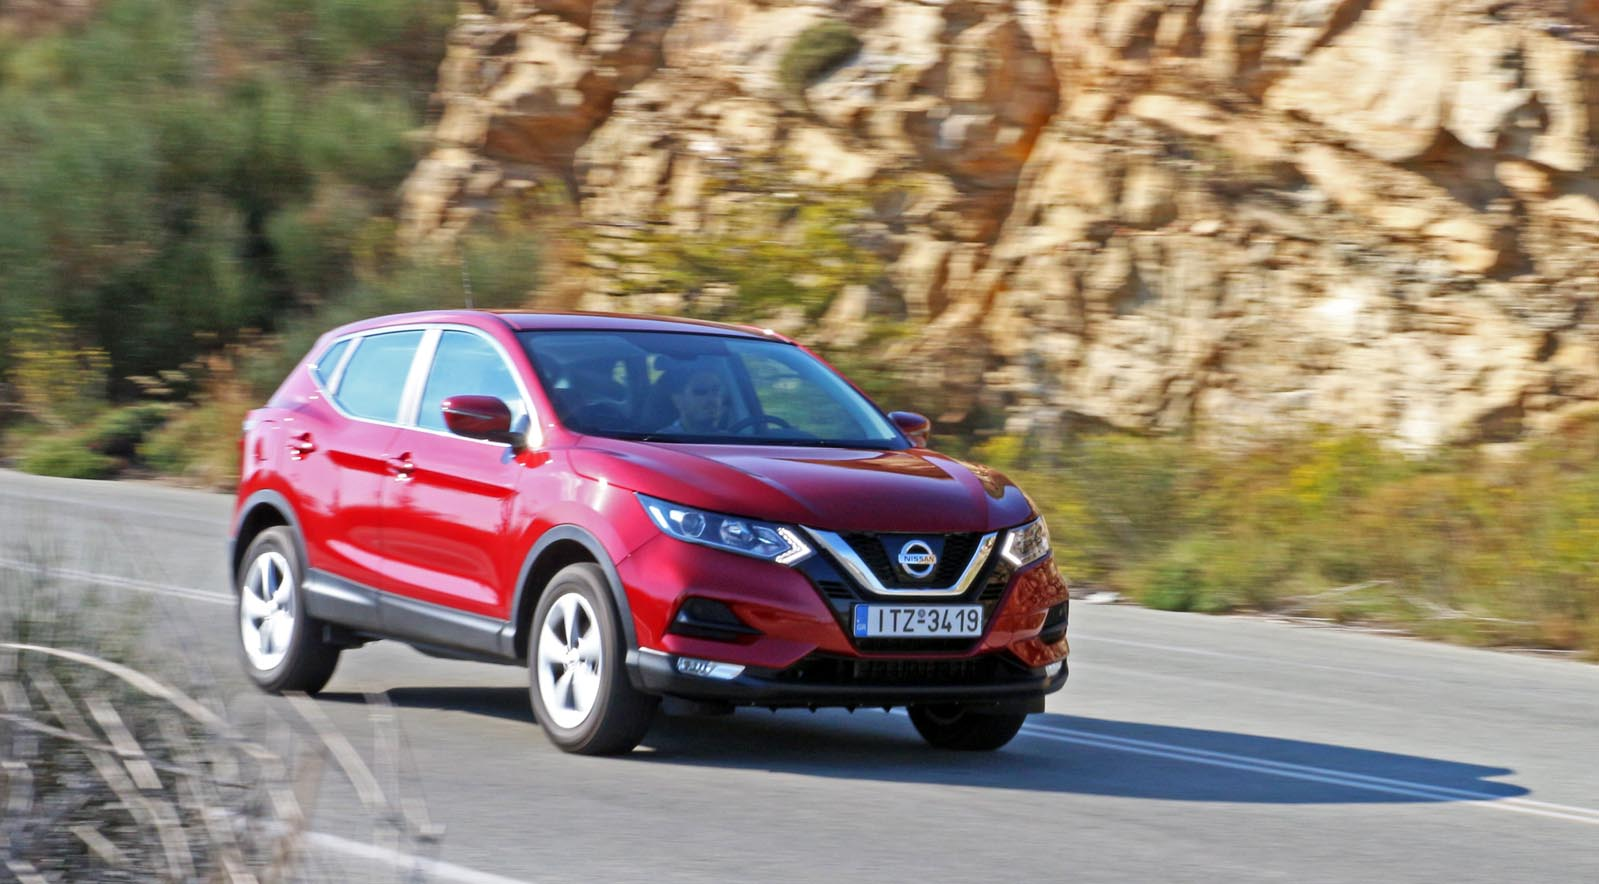 Photo of Nissan Qashqai 1.5 dCi [test drive]